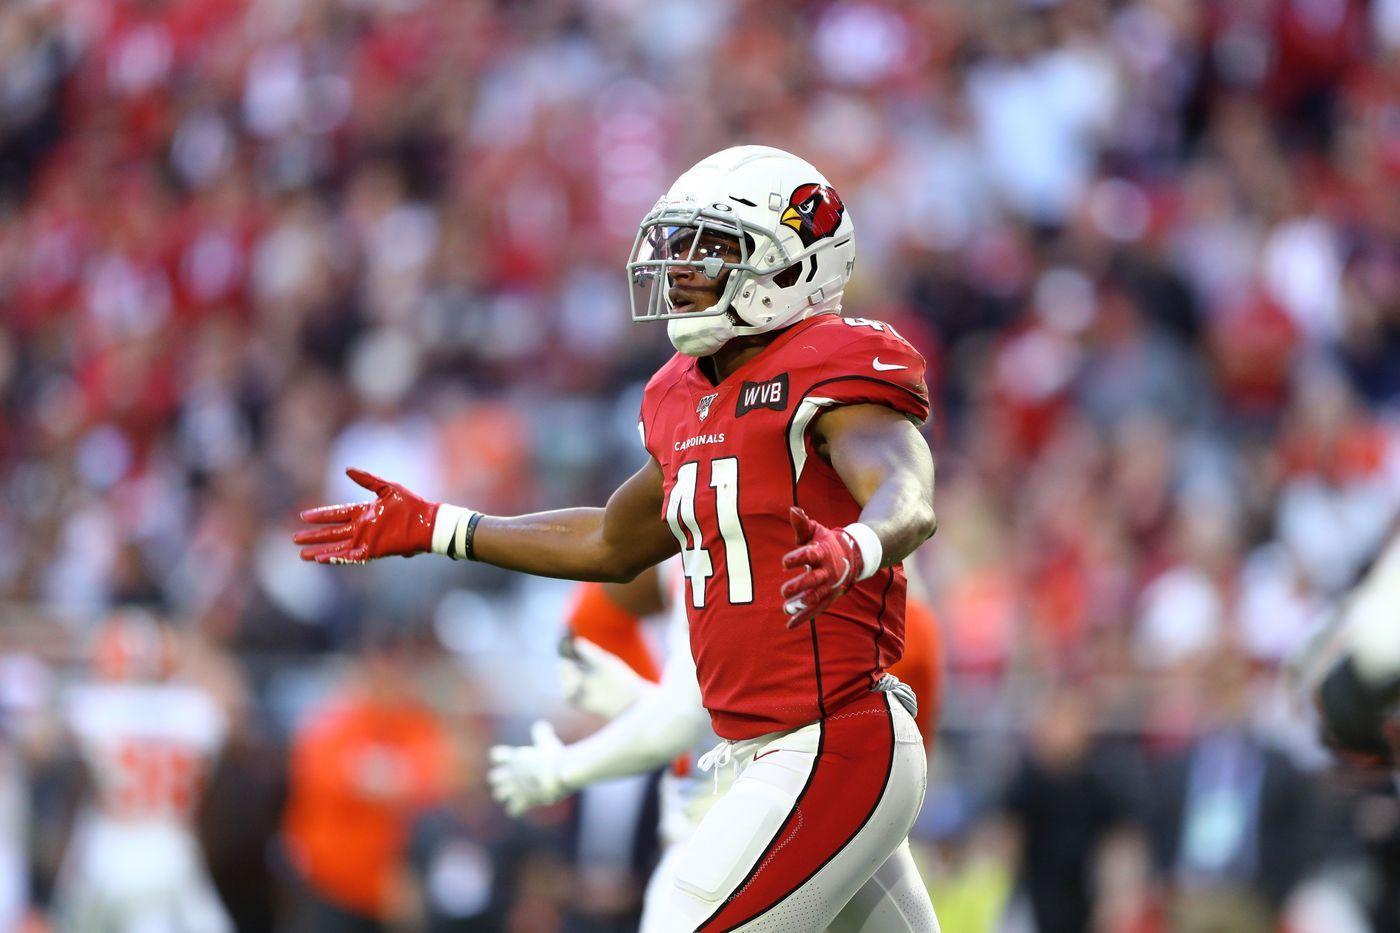 Kenyan Drake Arizona Cardinals Detroitsportsfrenzy Com In 2020 Kenyan Drake Arizona Cardinals Football Helmets